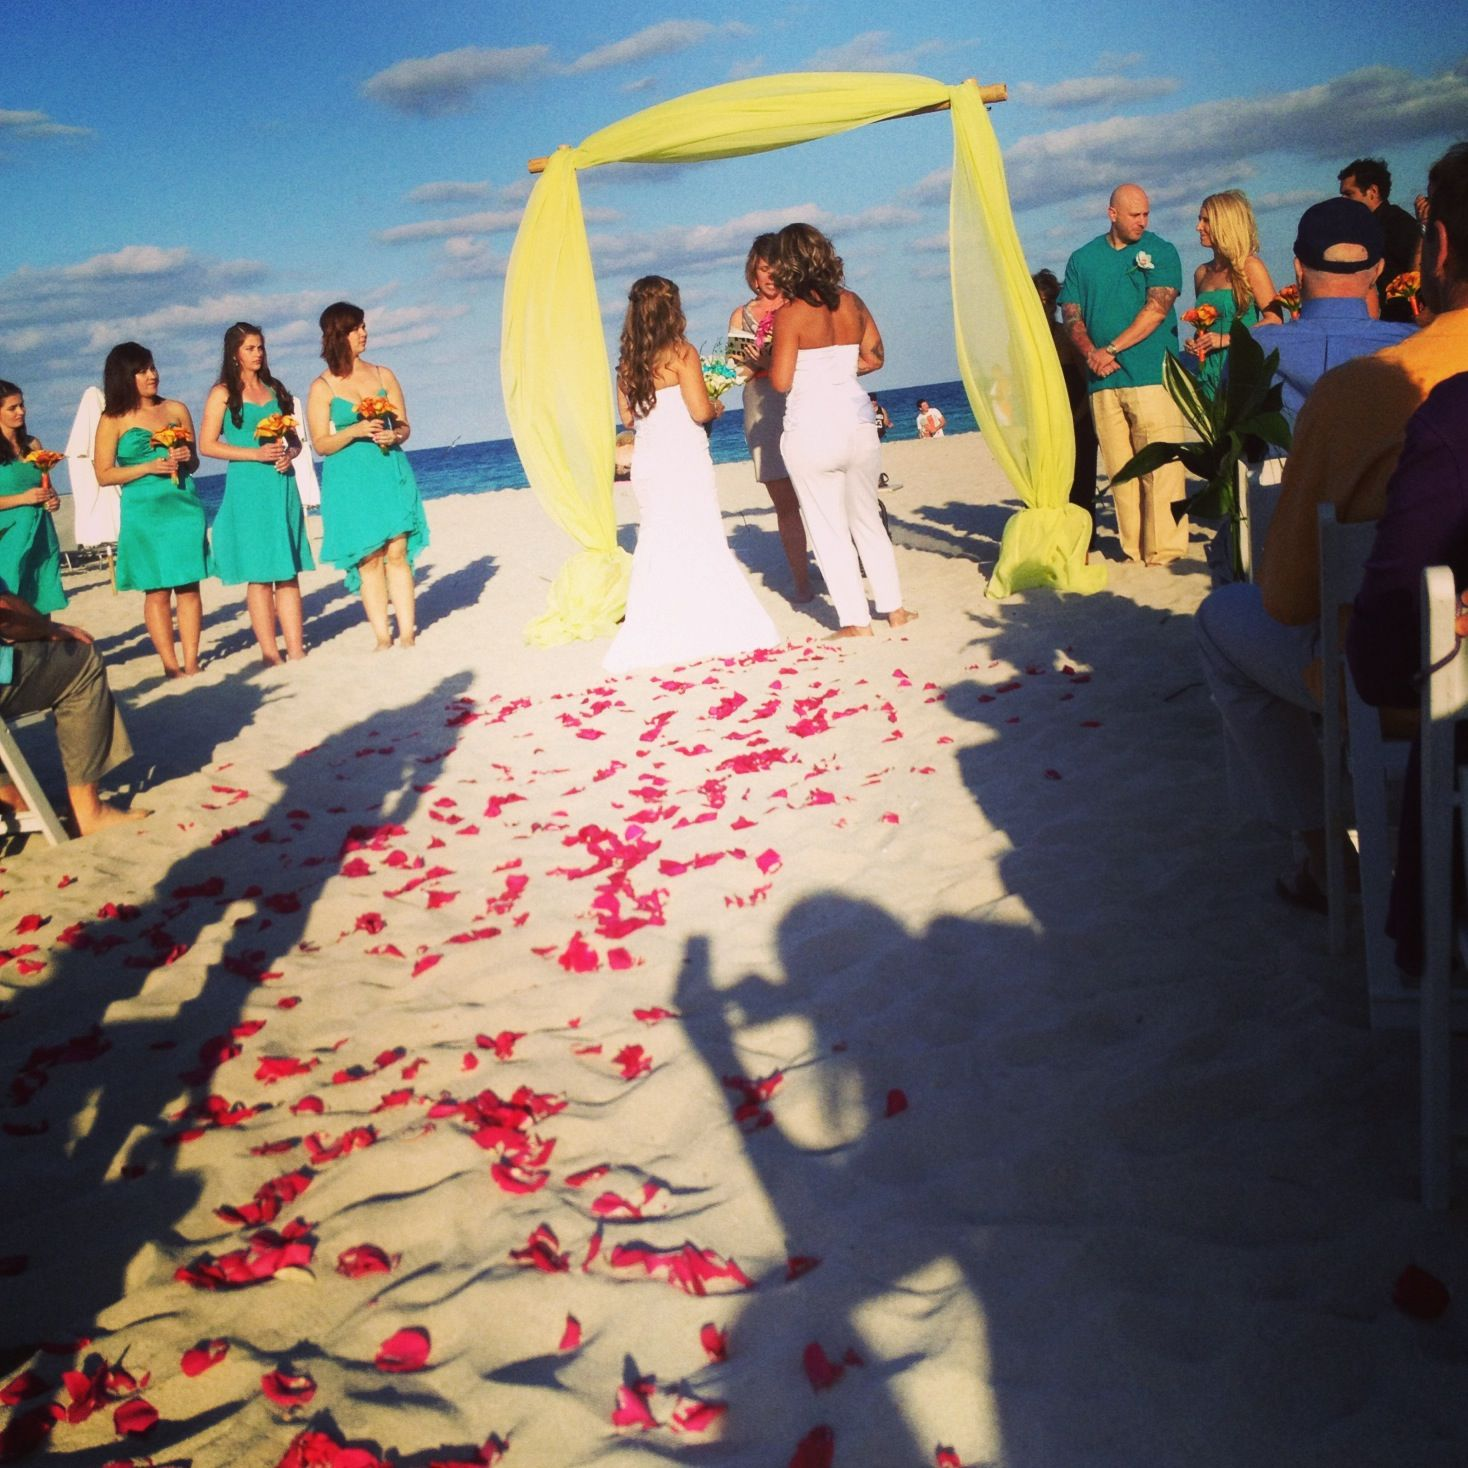 Long Beach Wedding Ceremony Only: Épinglé Sur Our Wedding And Key West